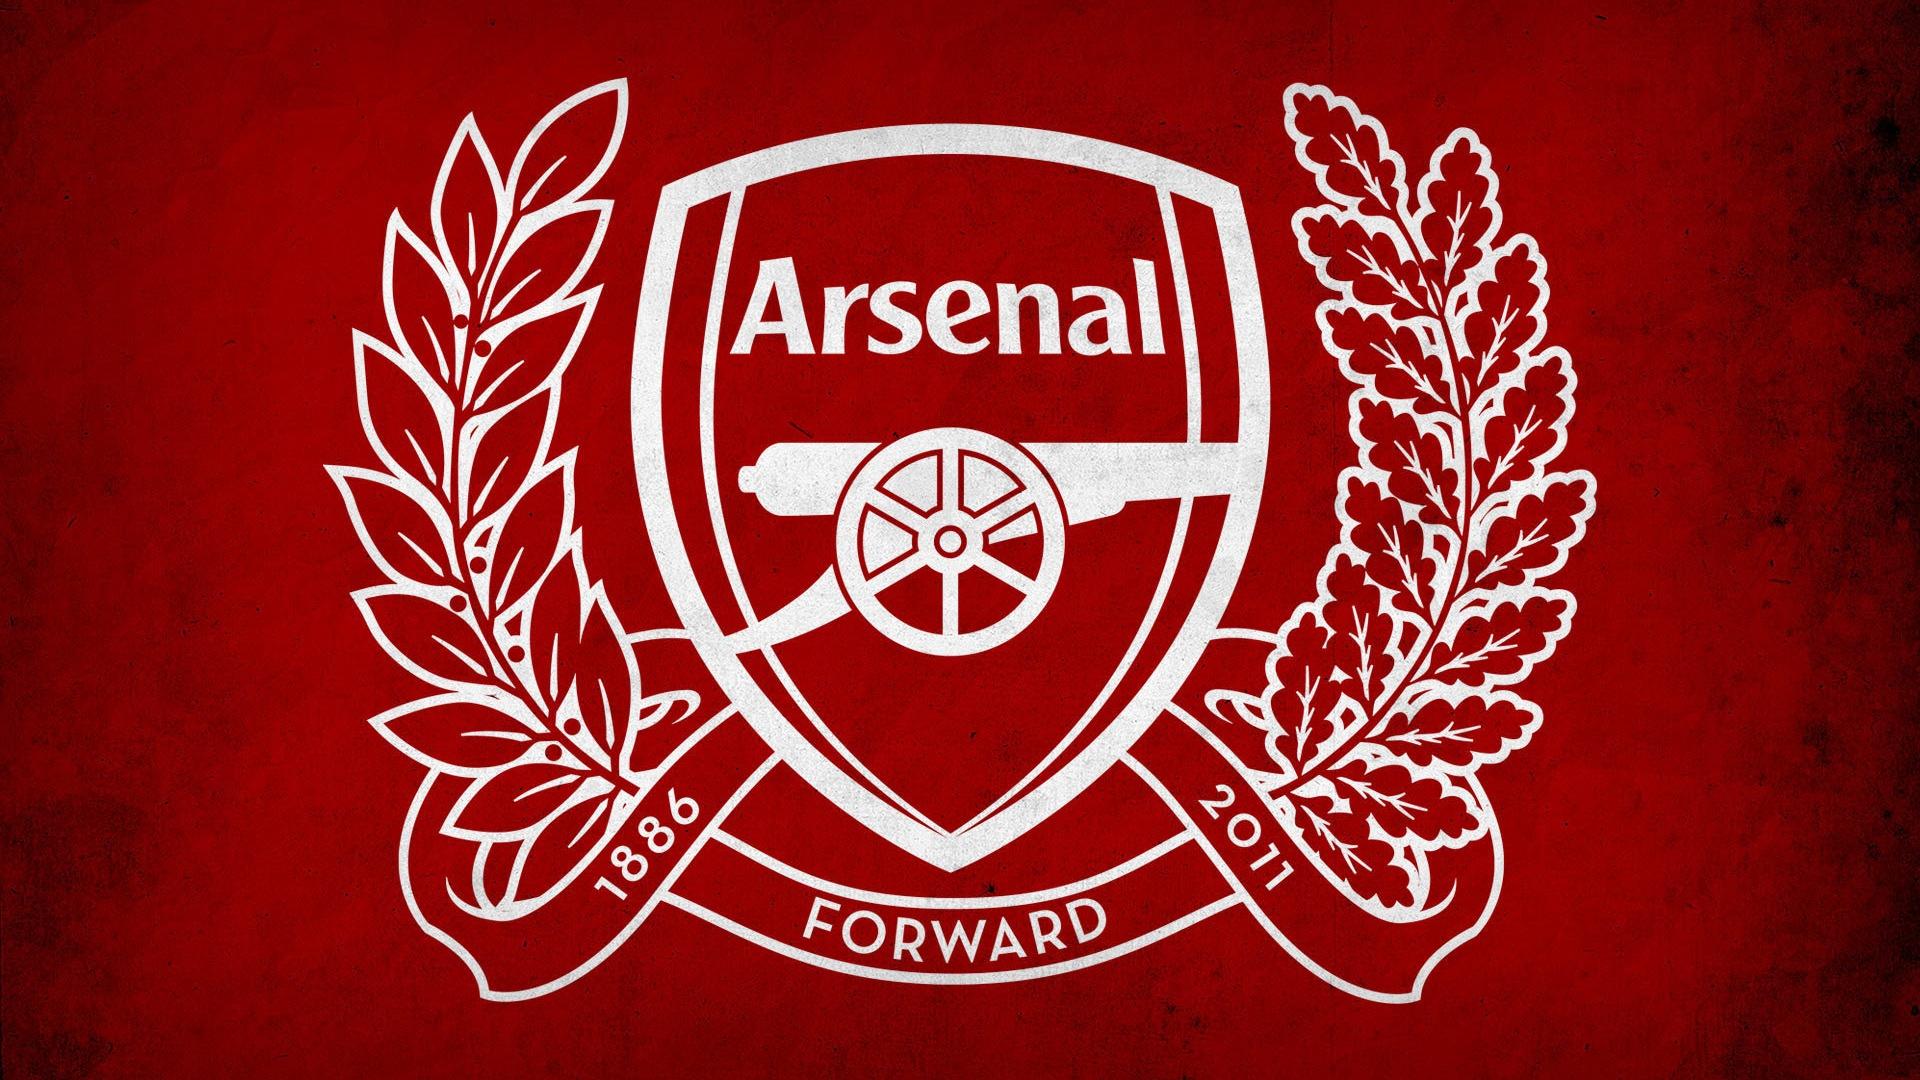 Arsenal logo Wallpaper, Desktop Wallpapers, Free Wallpapers ...